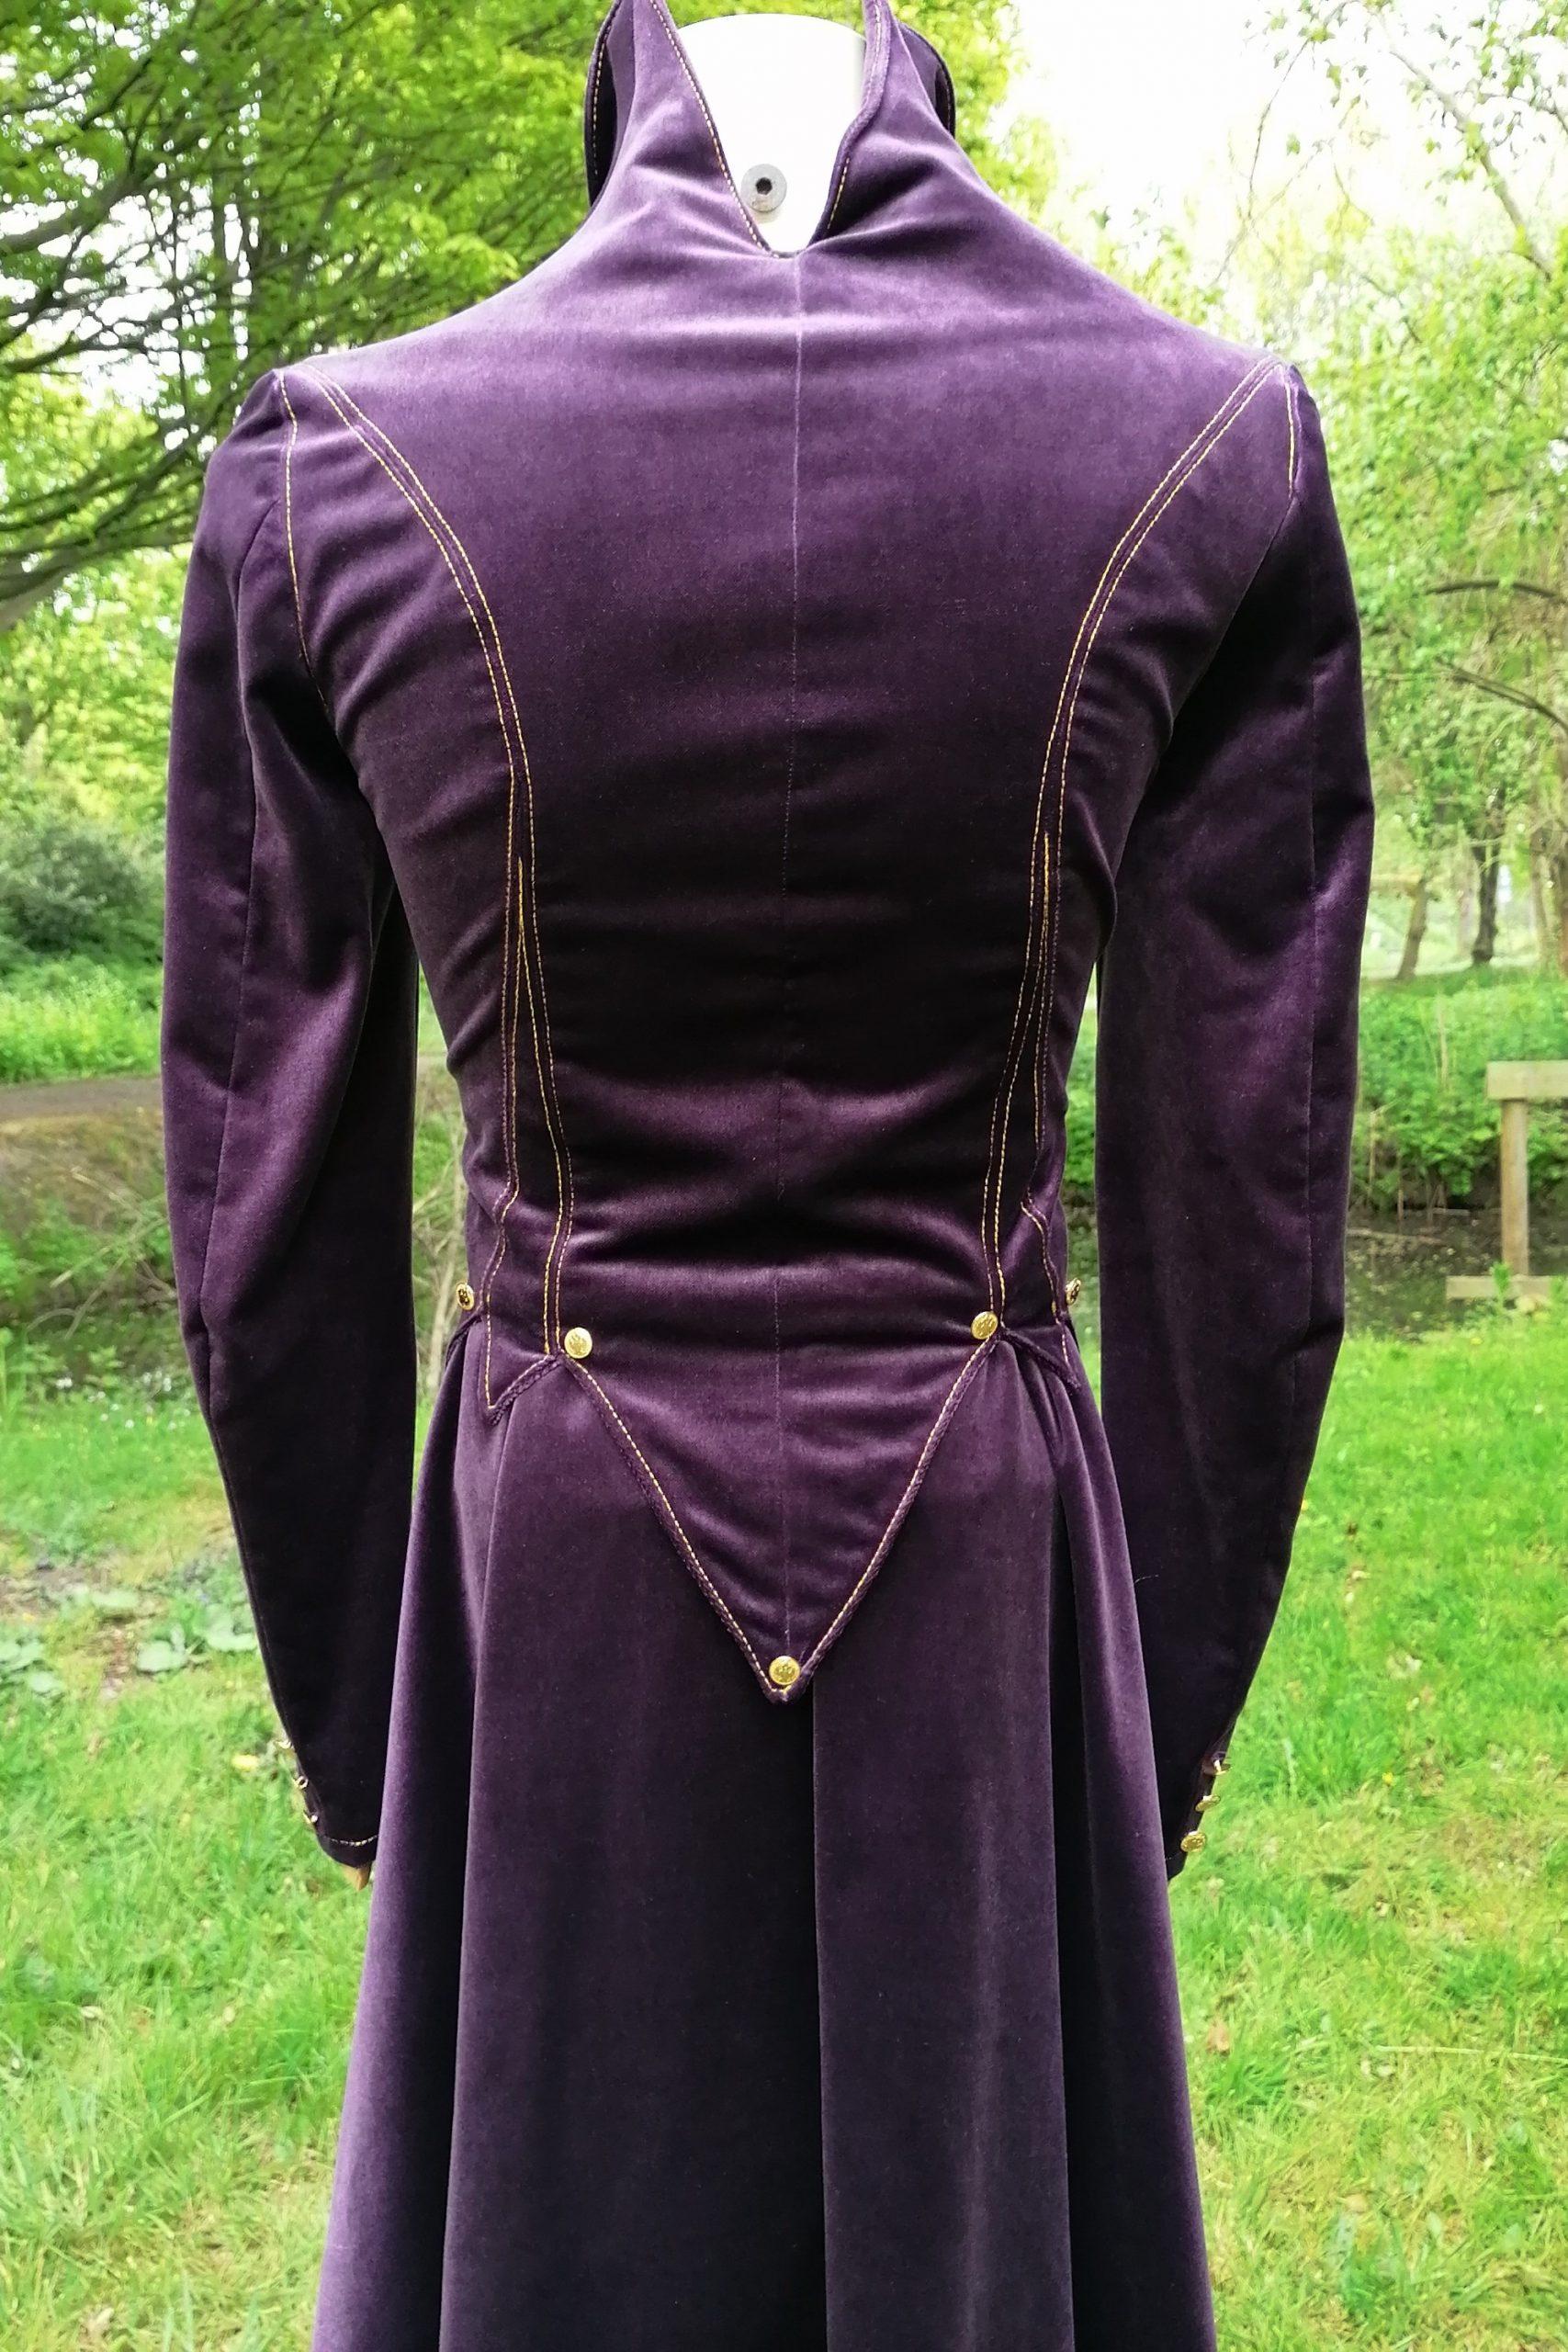 Jacket Coat Purple Velvet Gold Metallic Prince Vintage Jacquard Blazer